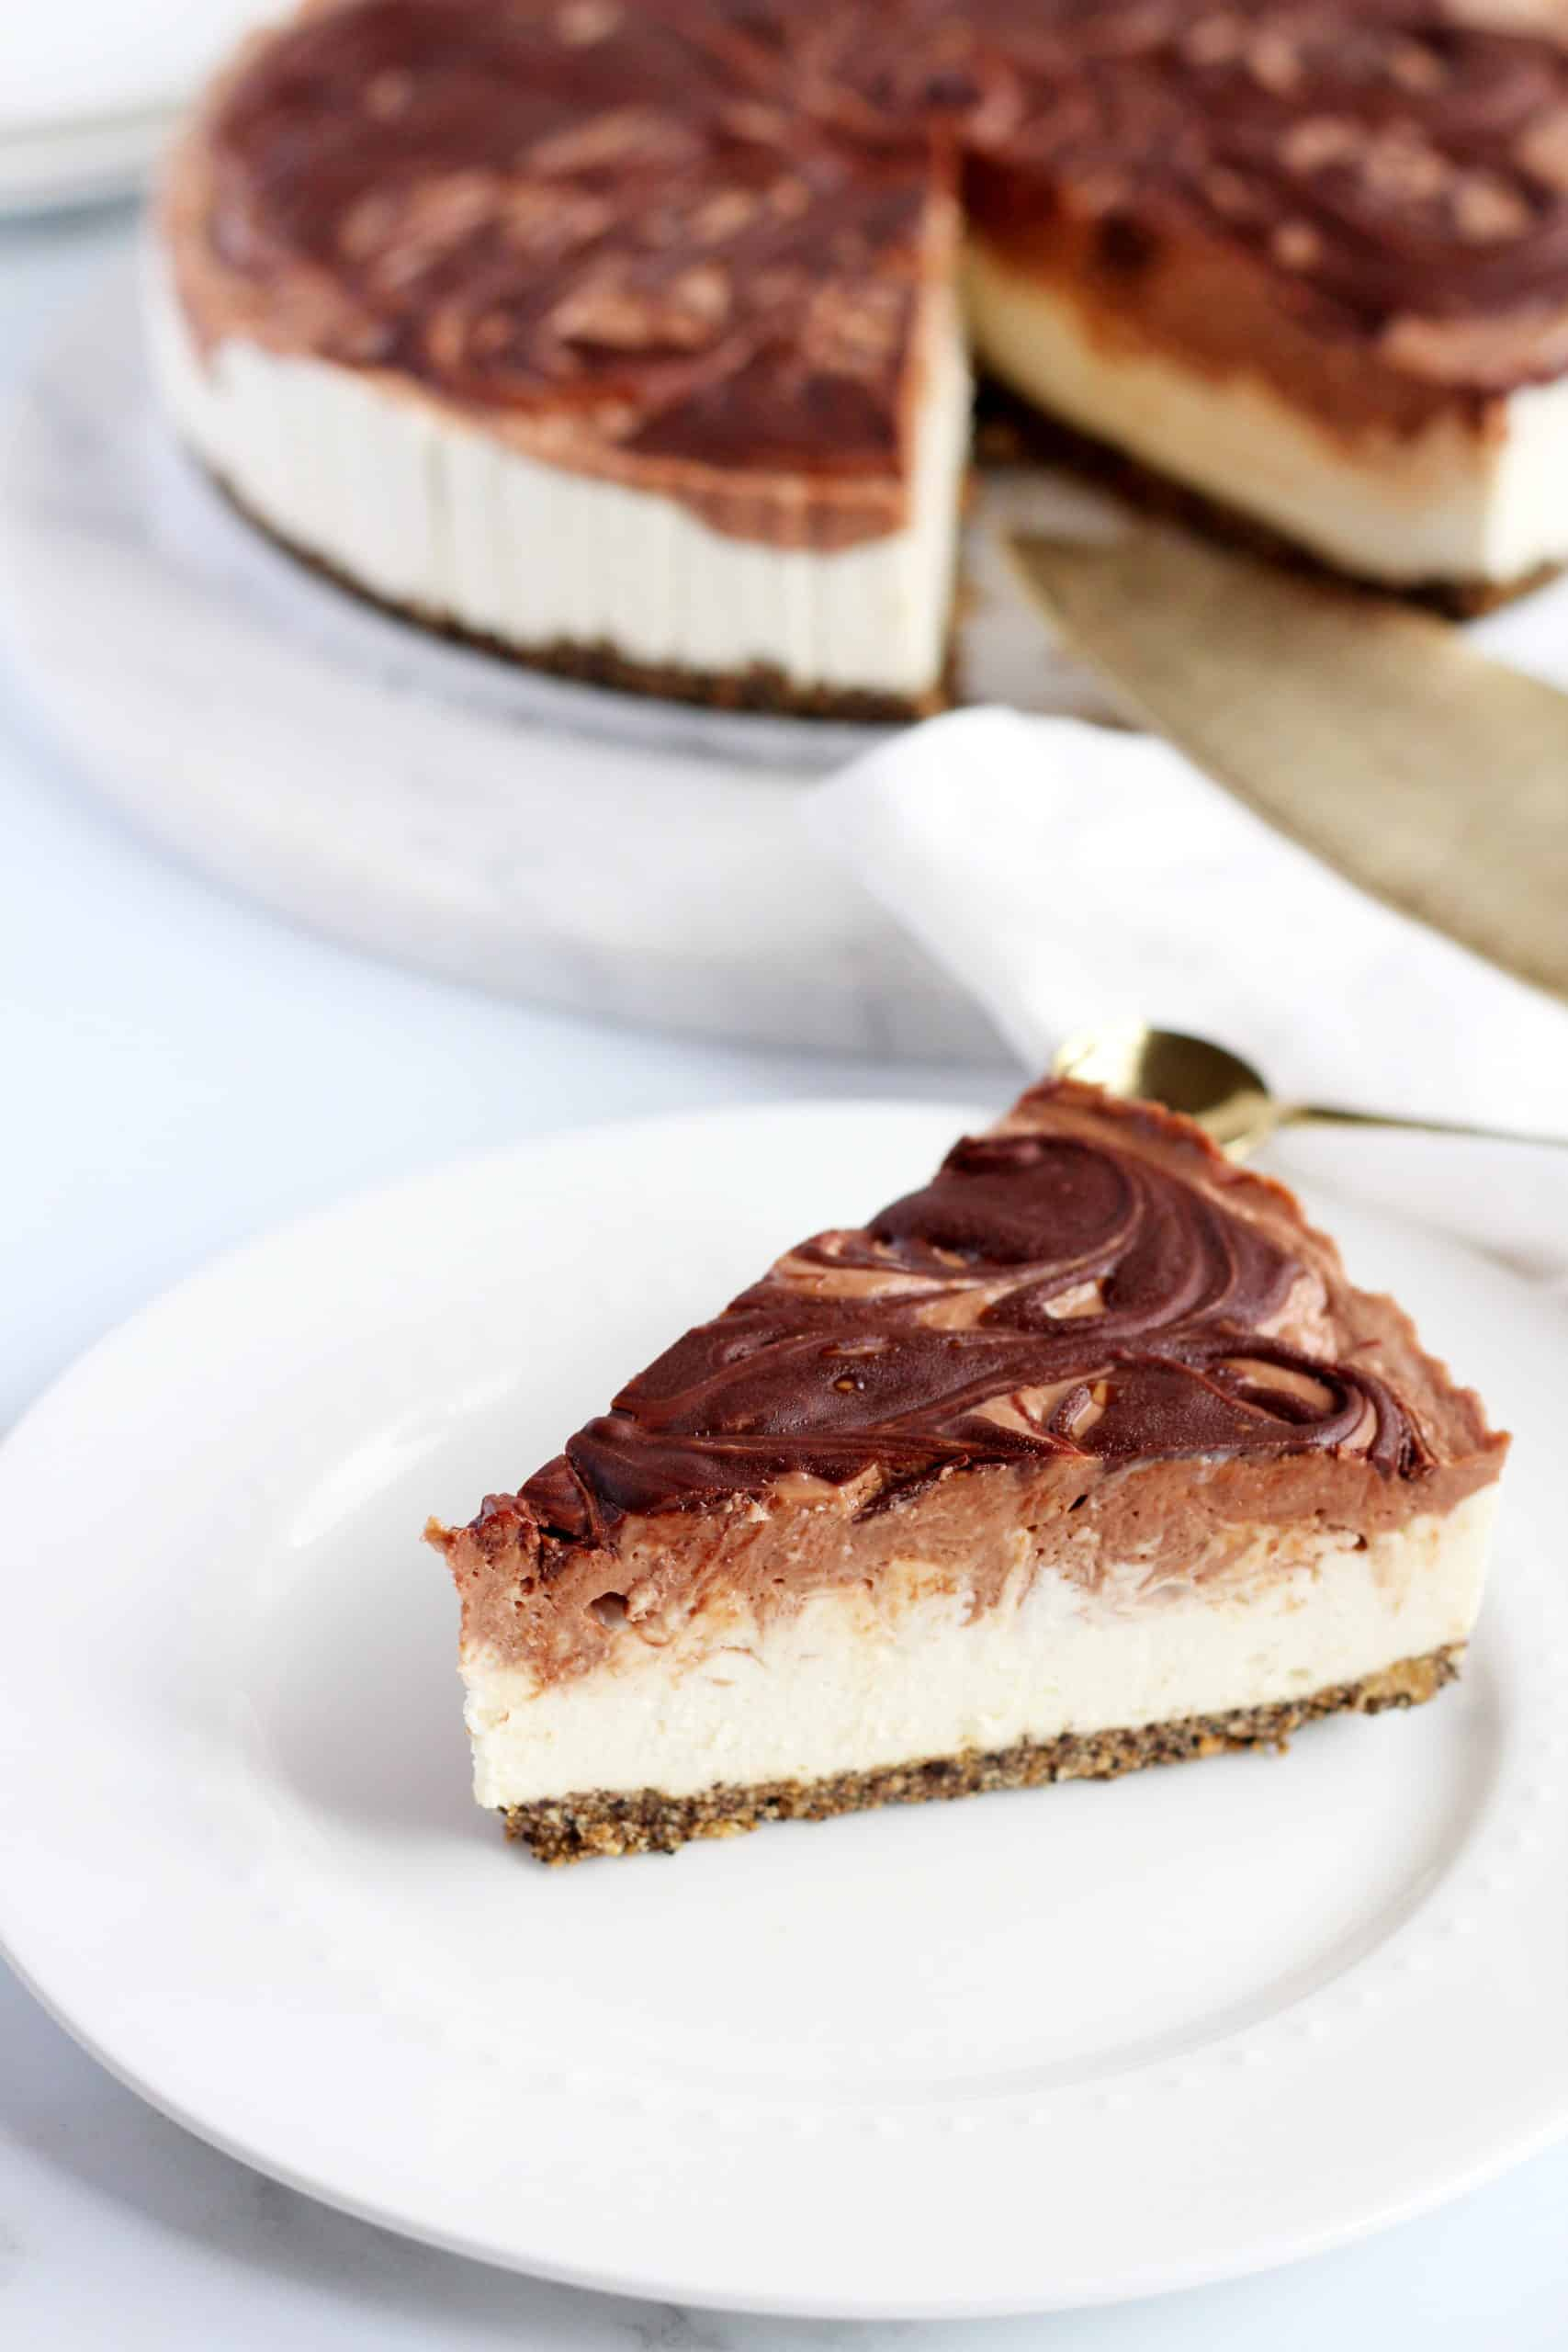 Nutella swirl Cheesecake on white plate